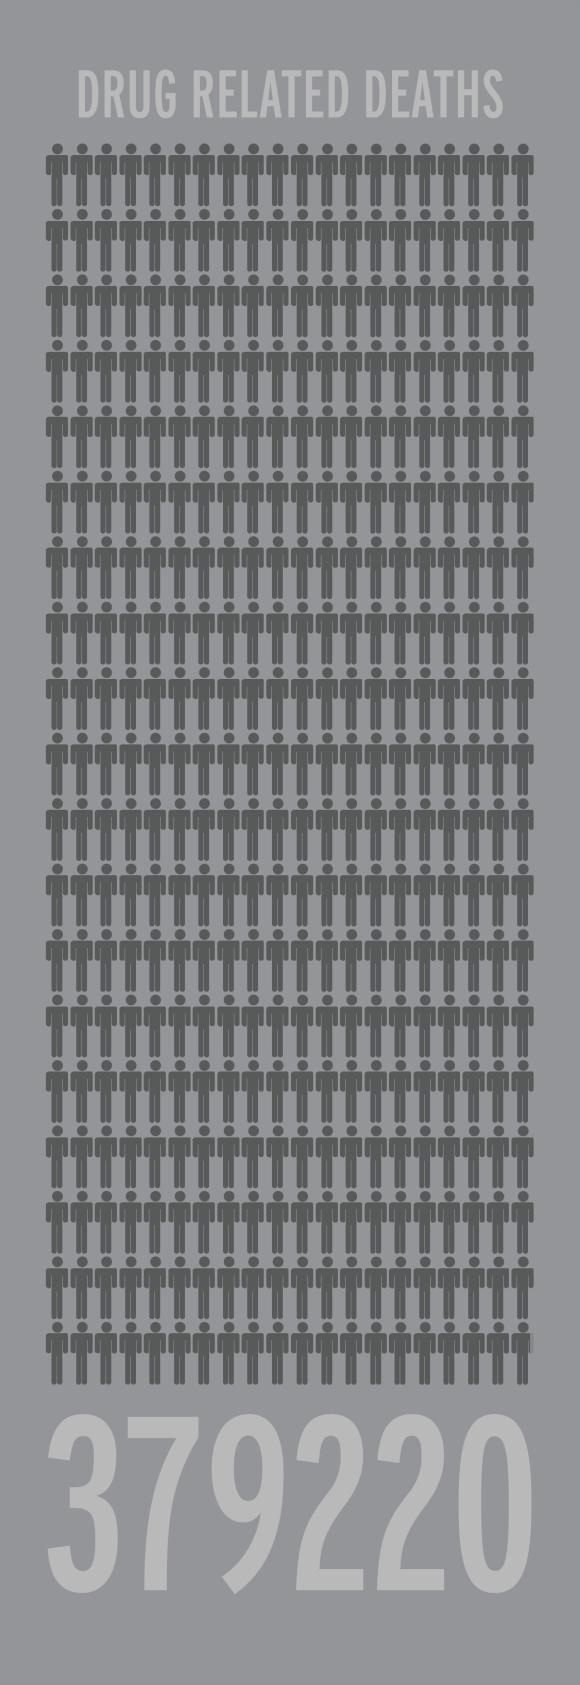 Drug Related Deaths